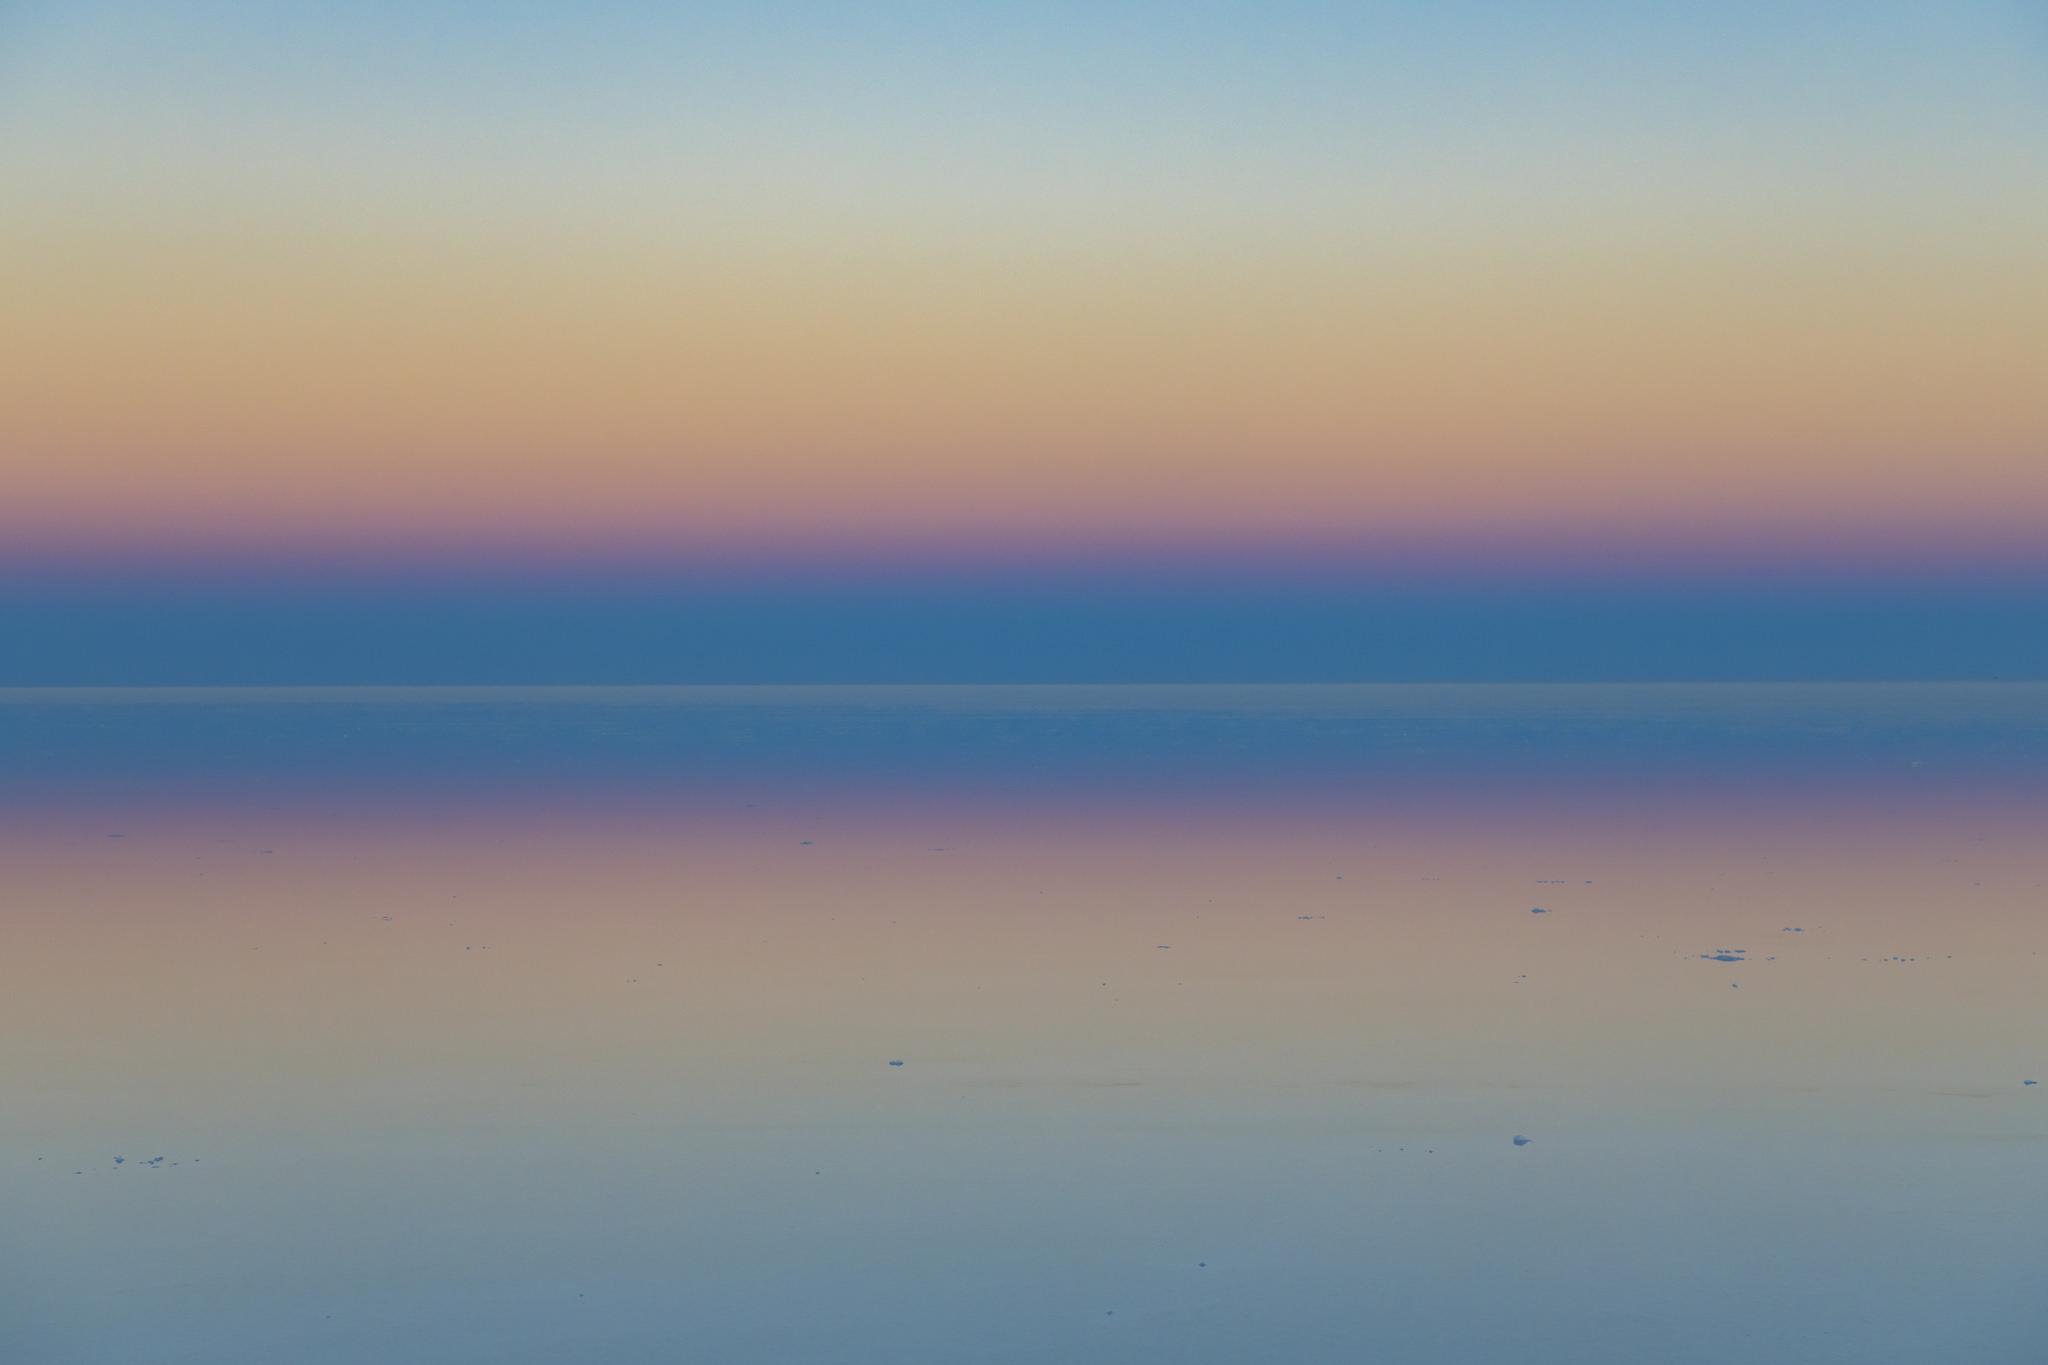 Where the Heavens and Earth Meet (Salar de Uyuni, Bolivia)